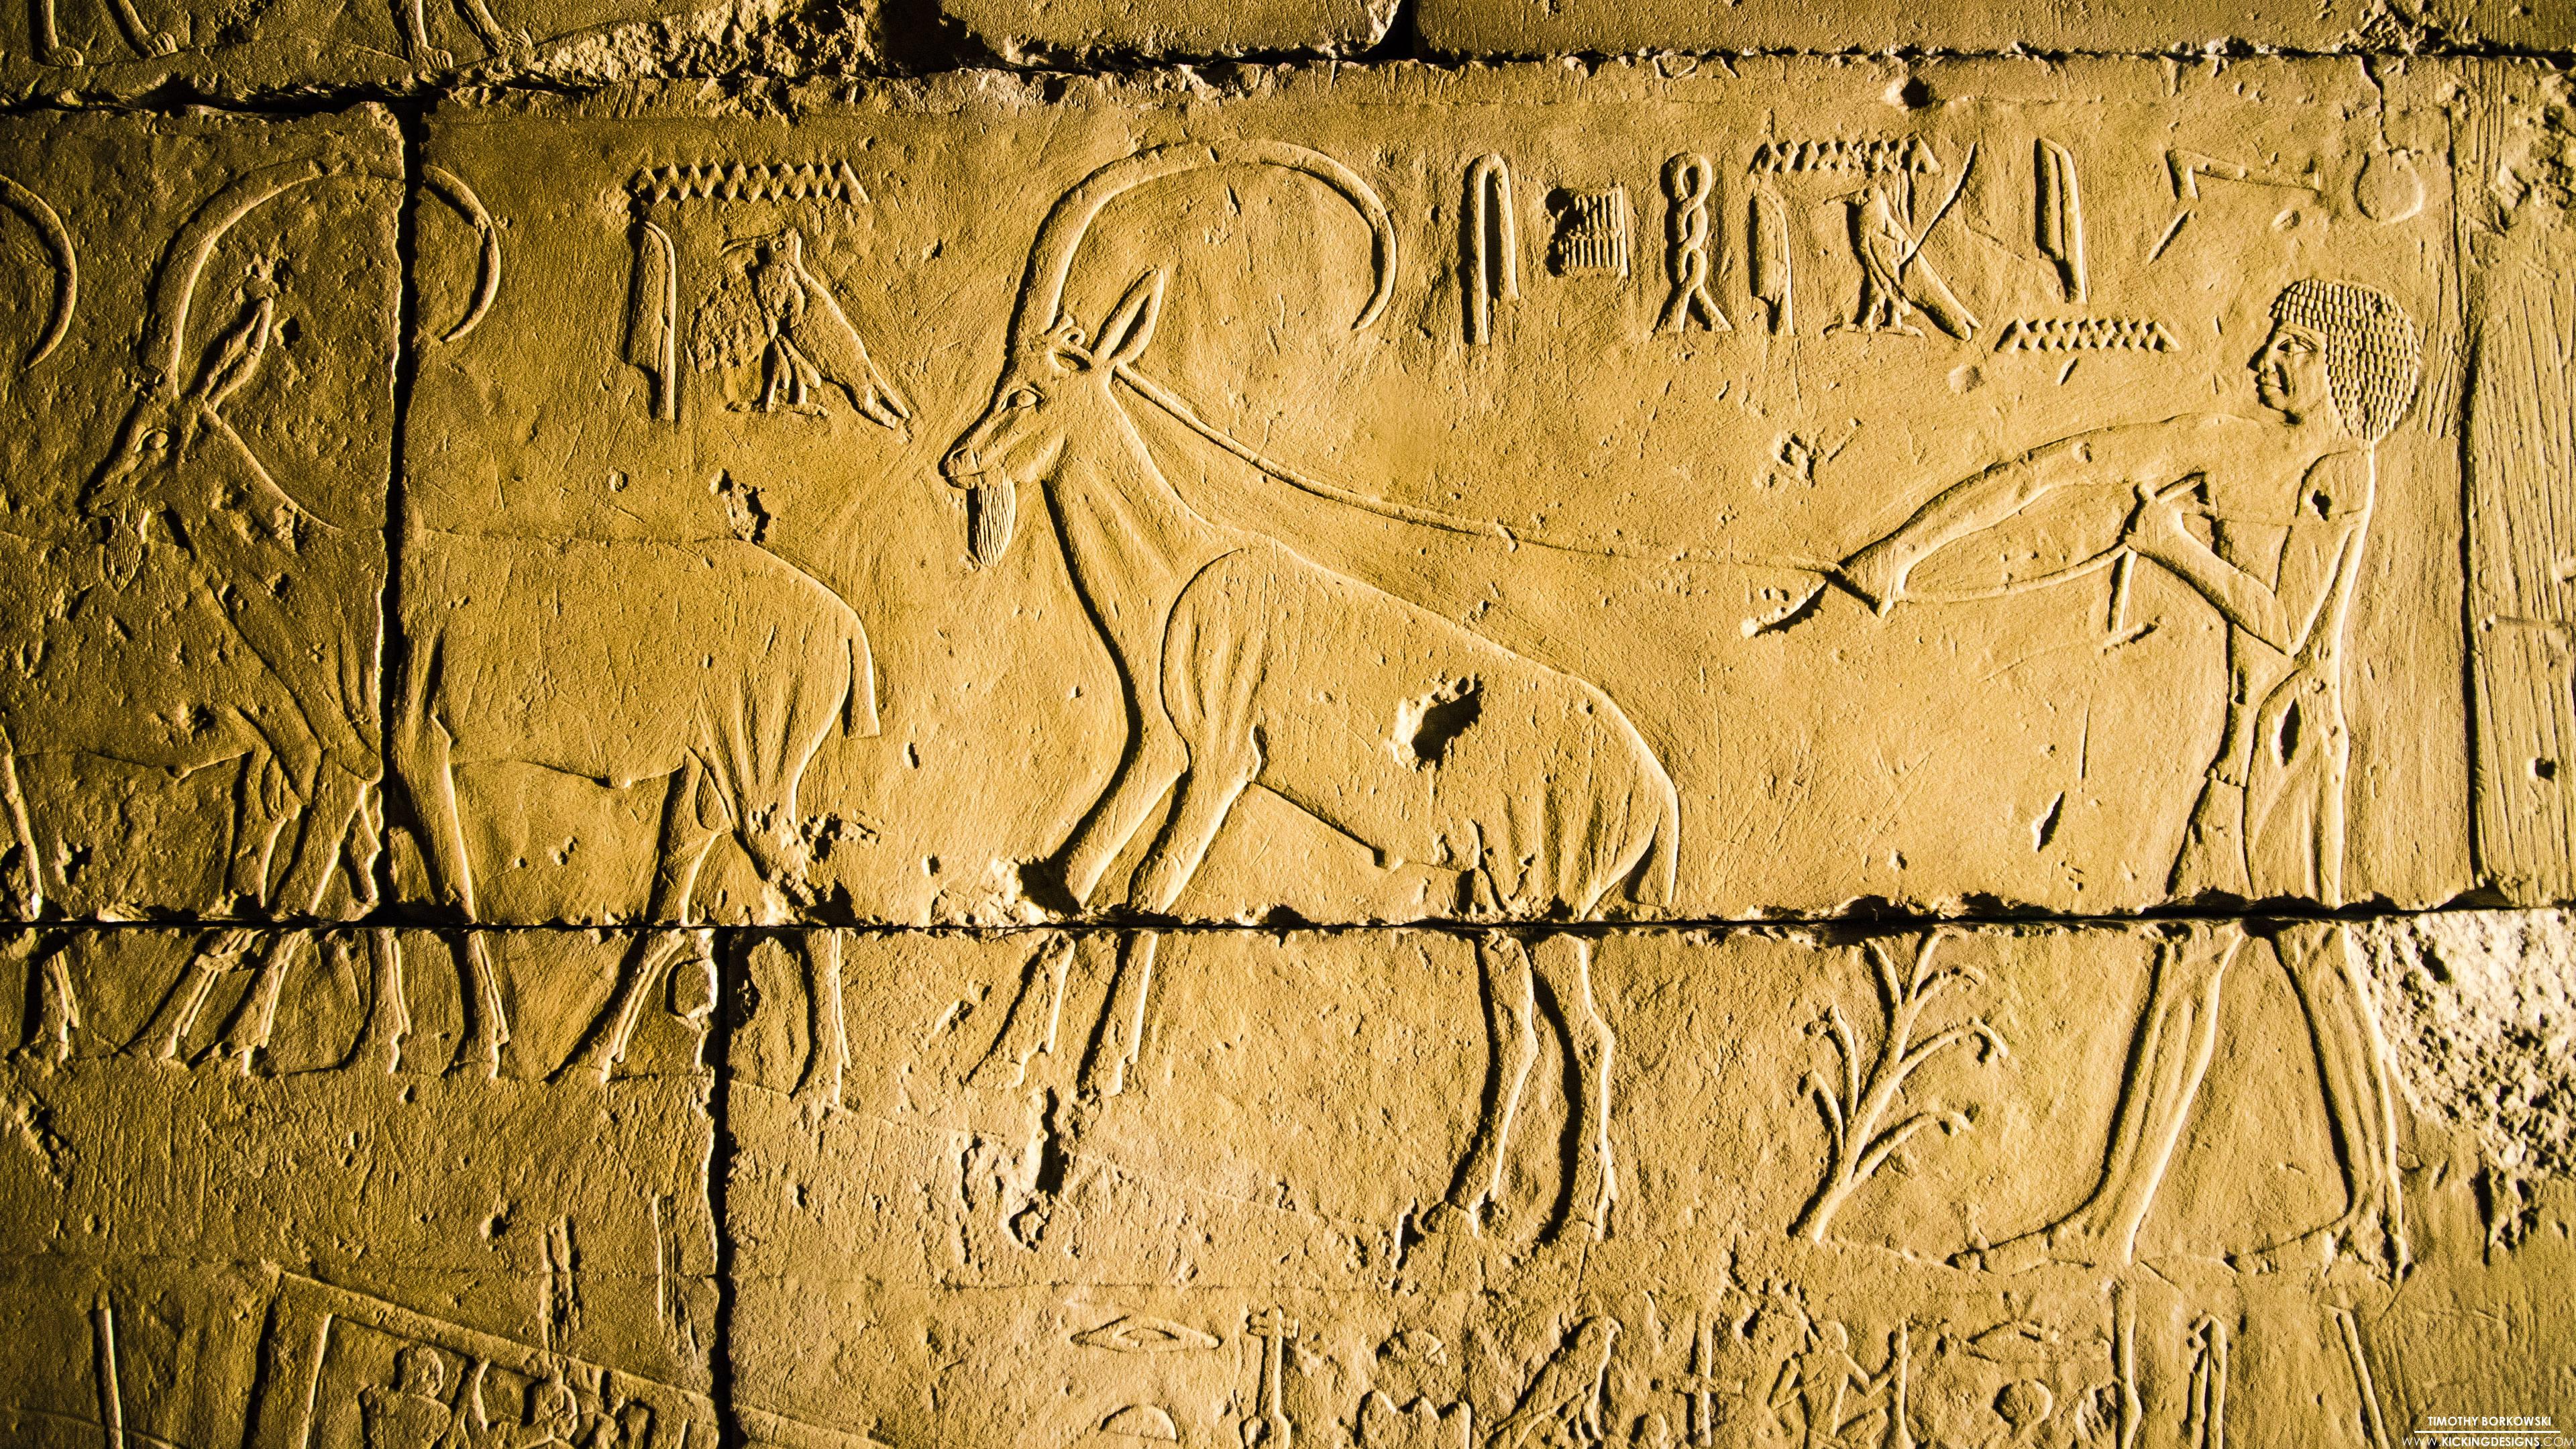 Egyptian Hieroglyphs 9-16-2016 Wallpaper Background